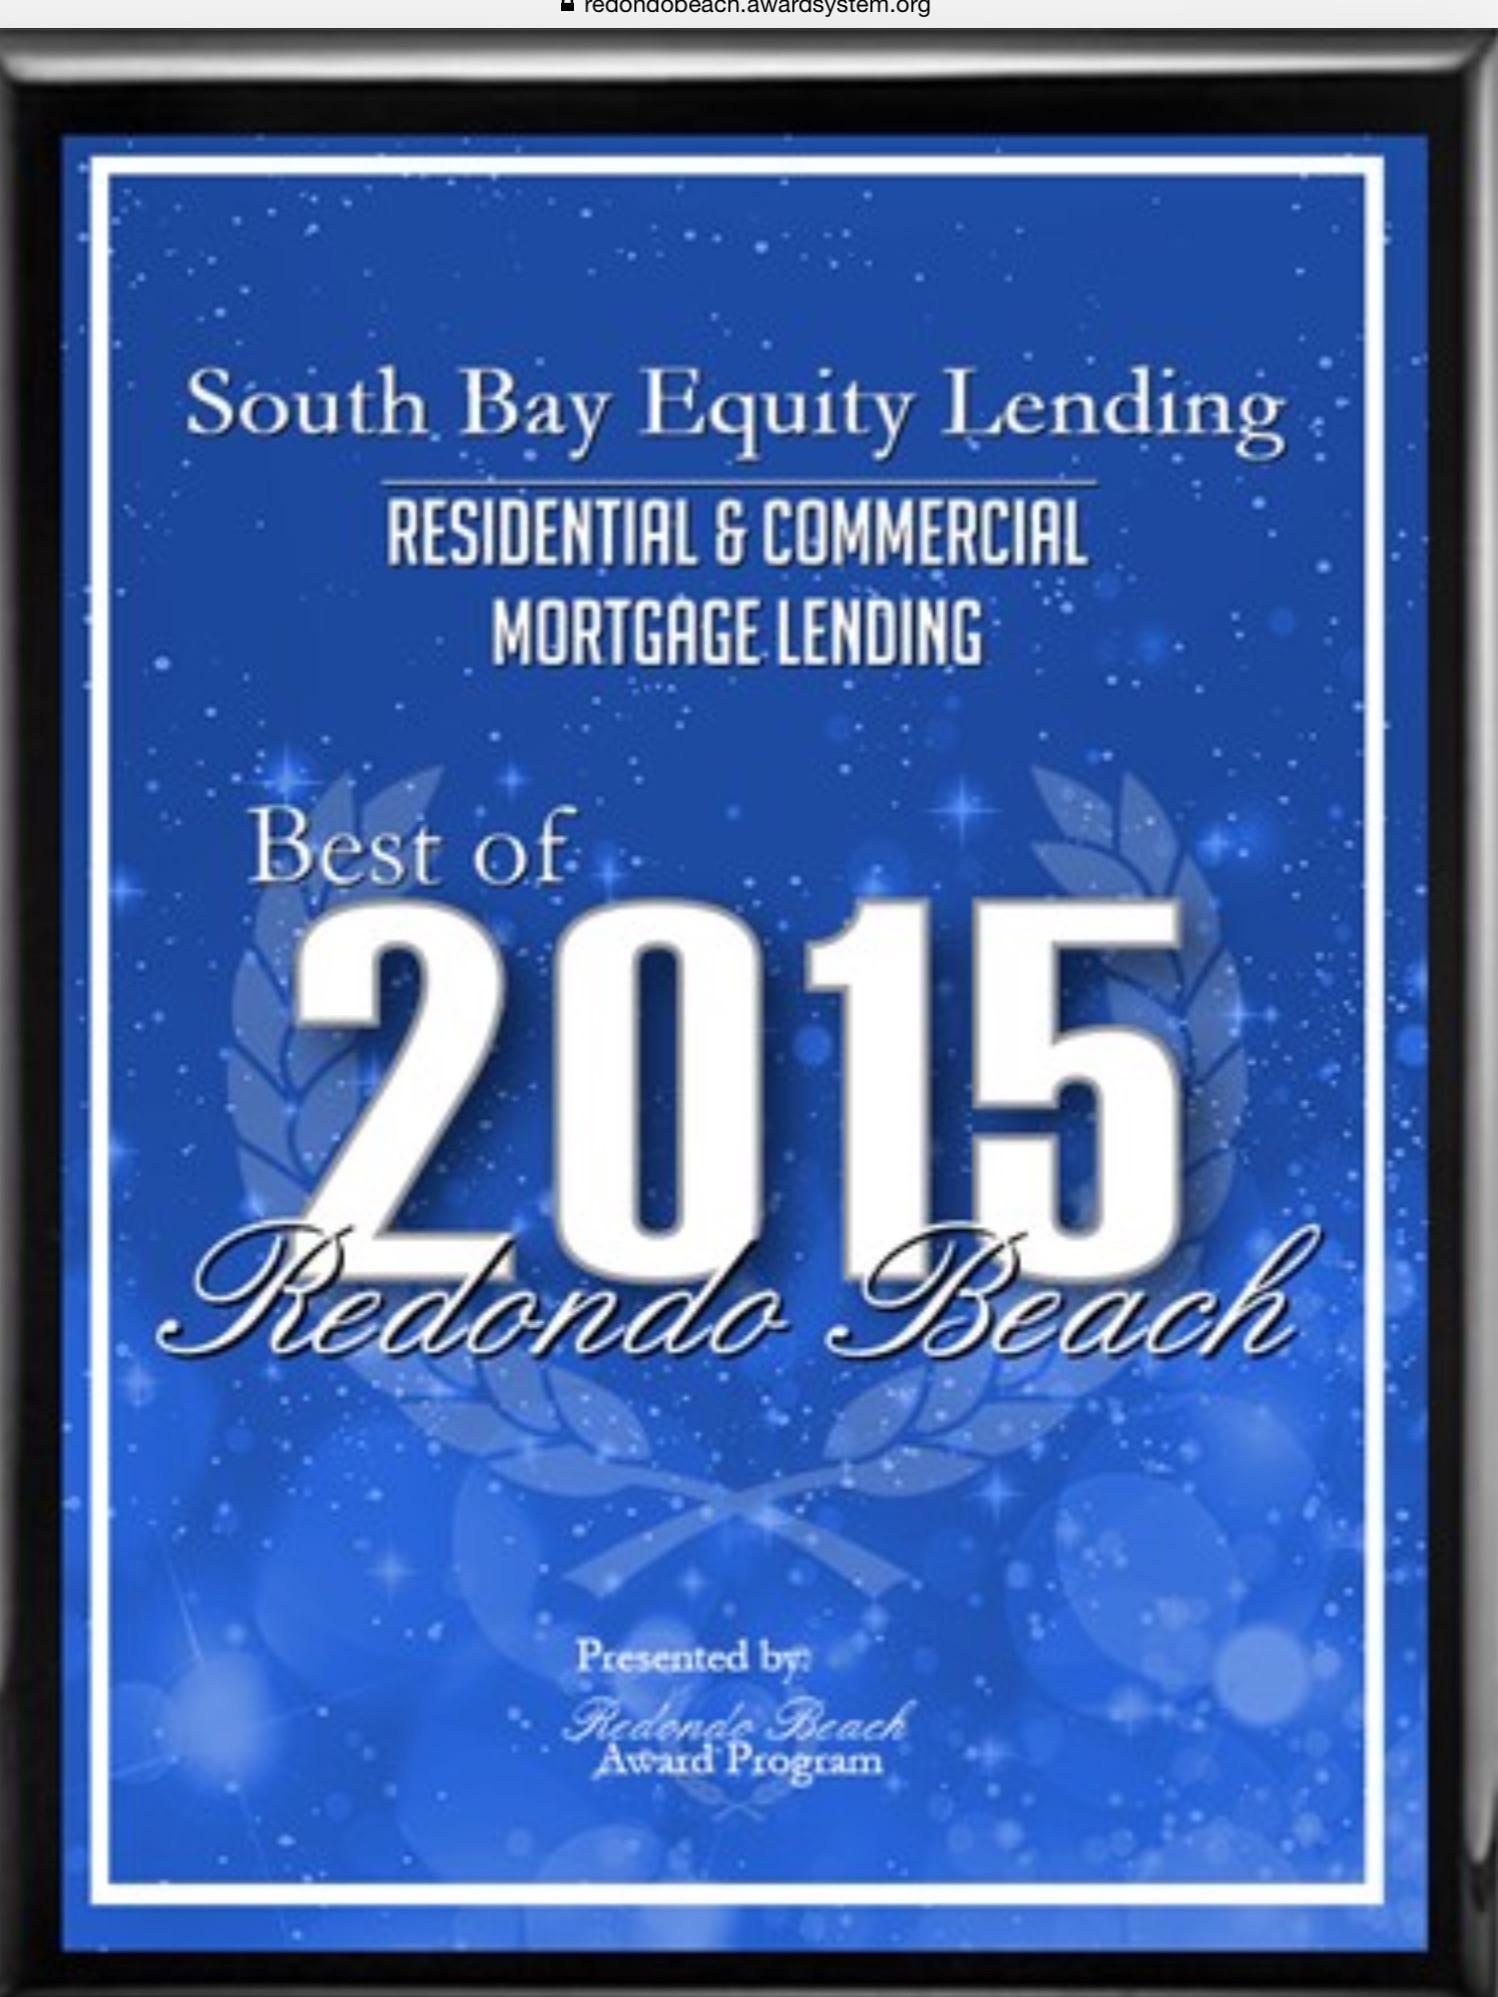 South Bay Equity Lending